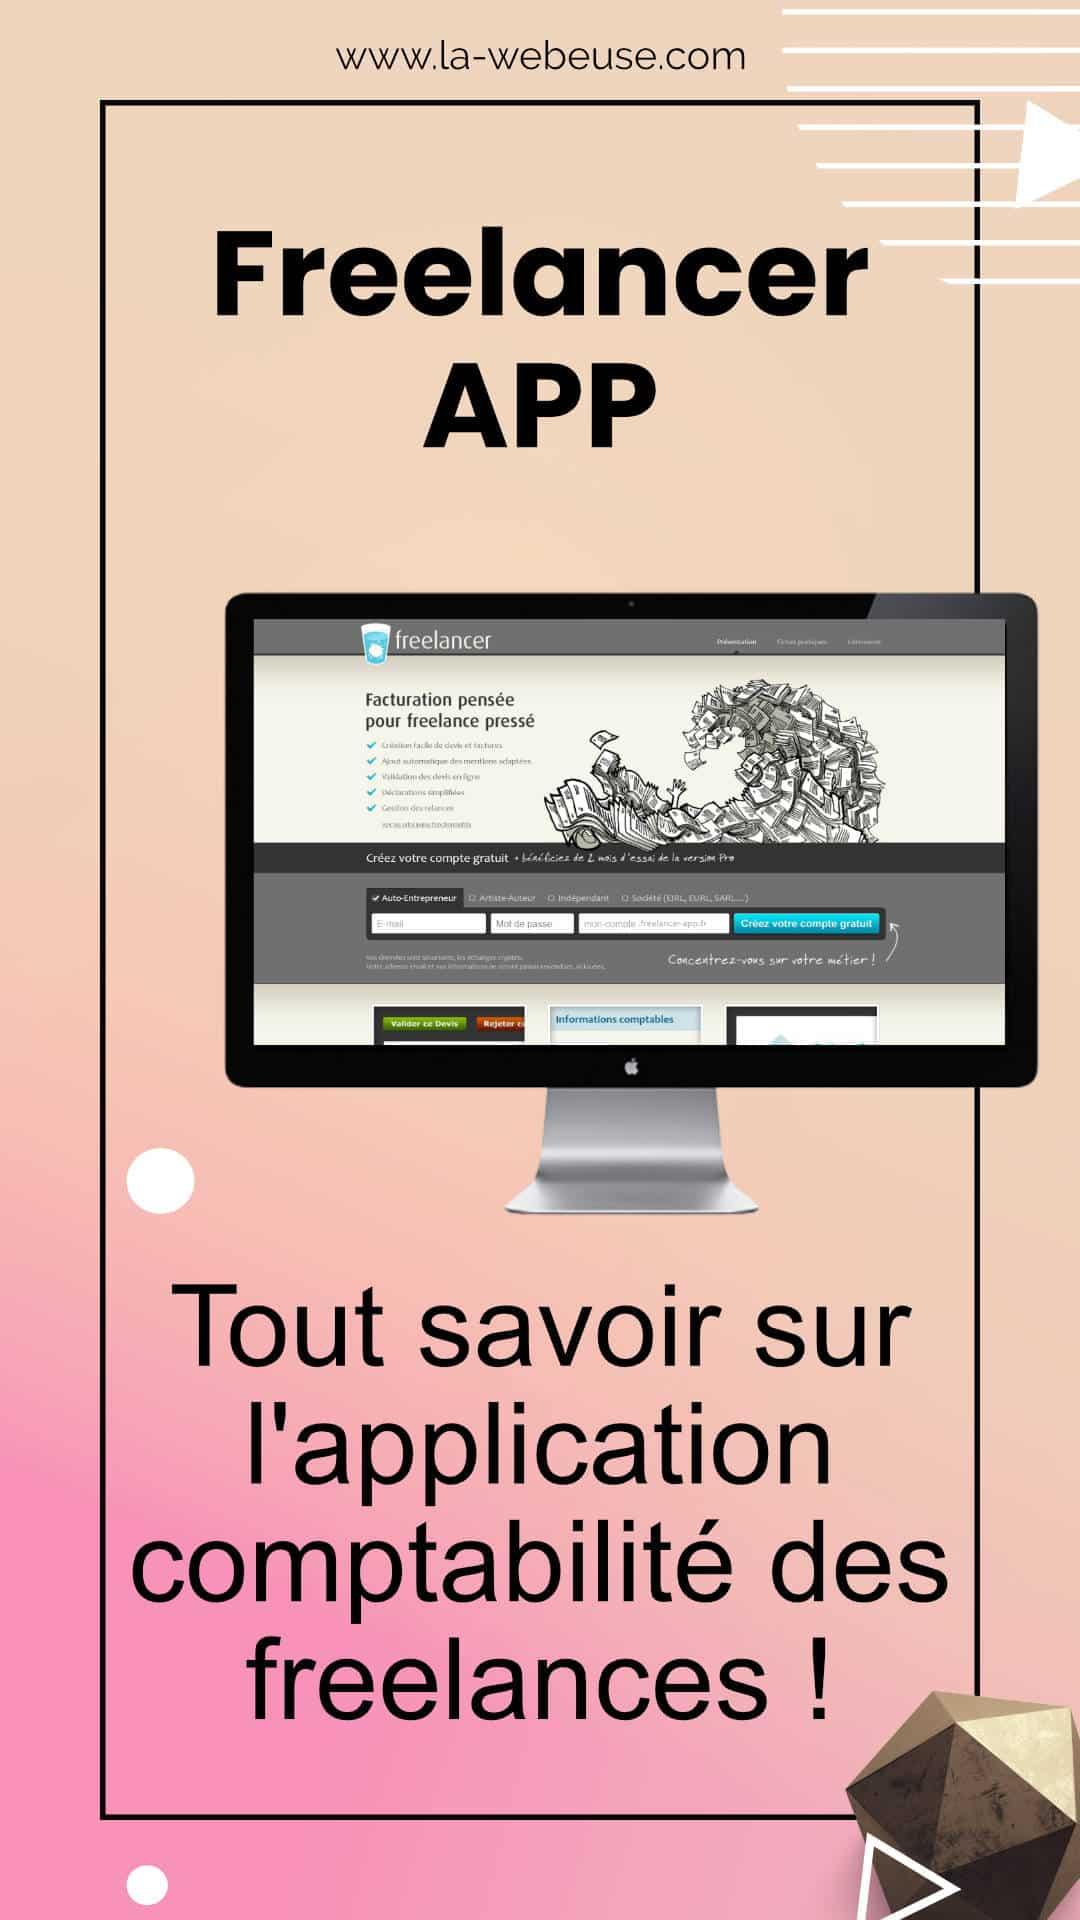 freelancer app comptabilité freelance